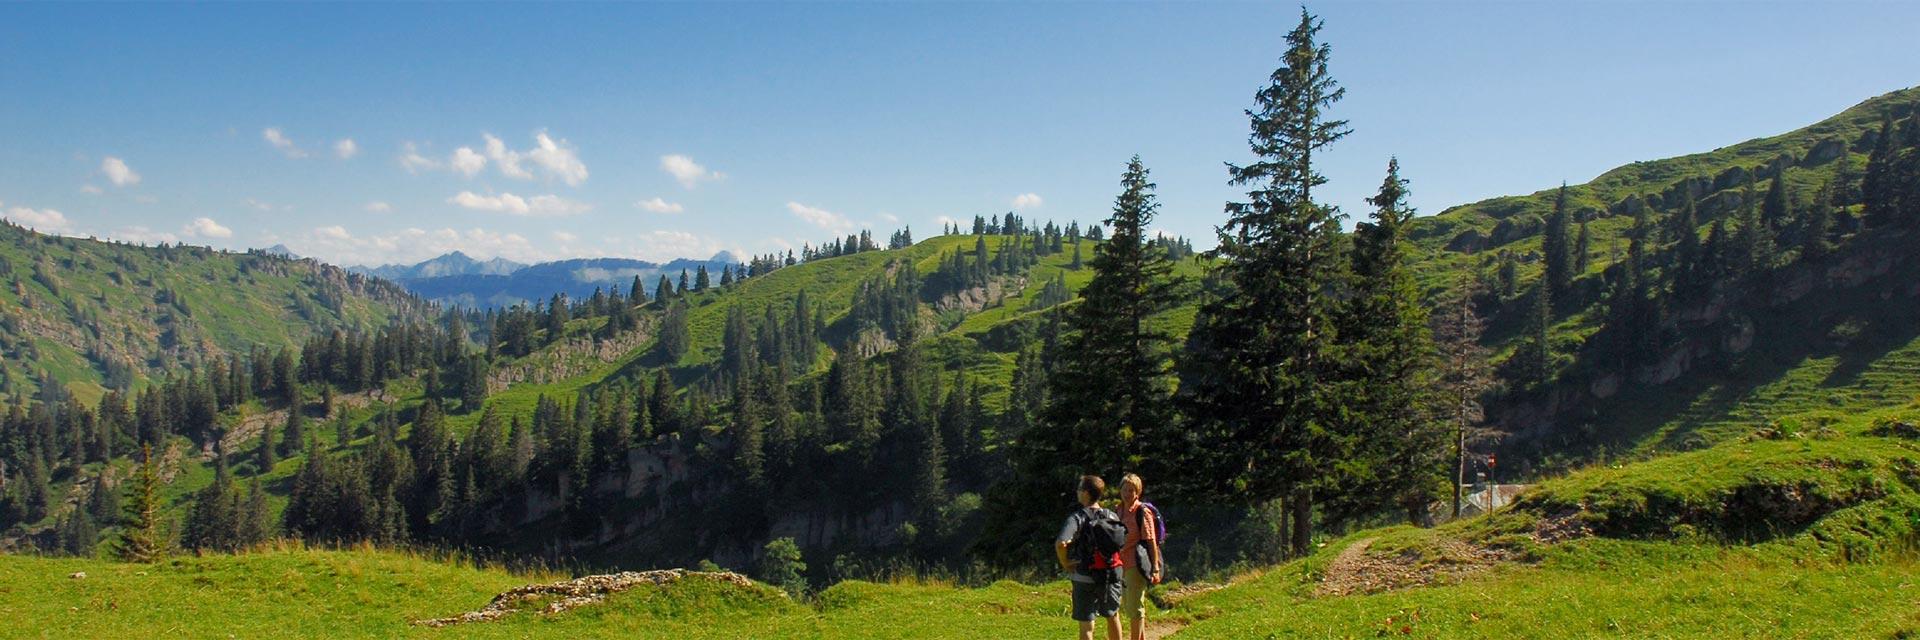 Hütten & Alpen